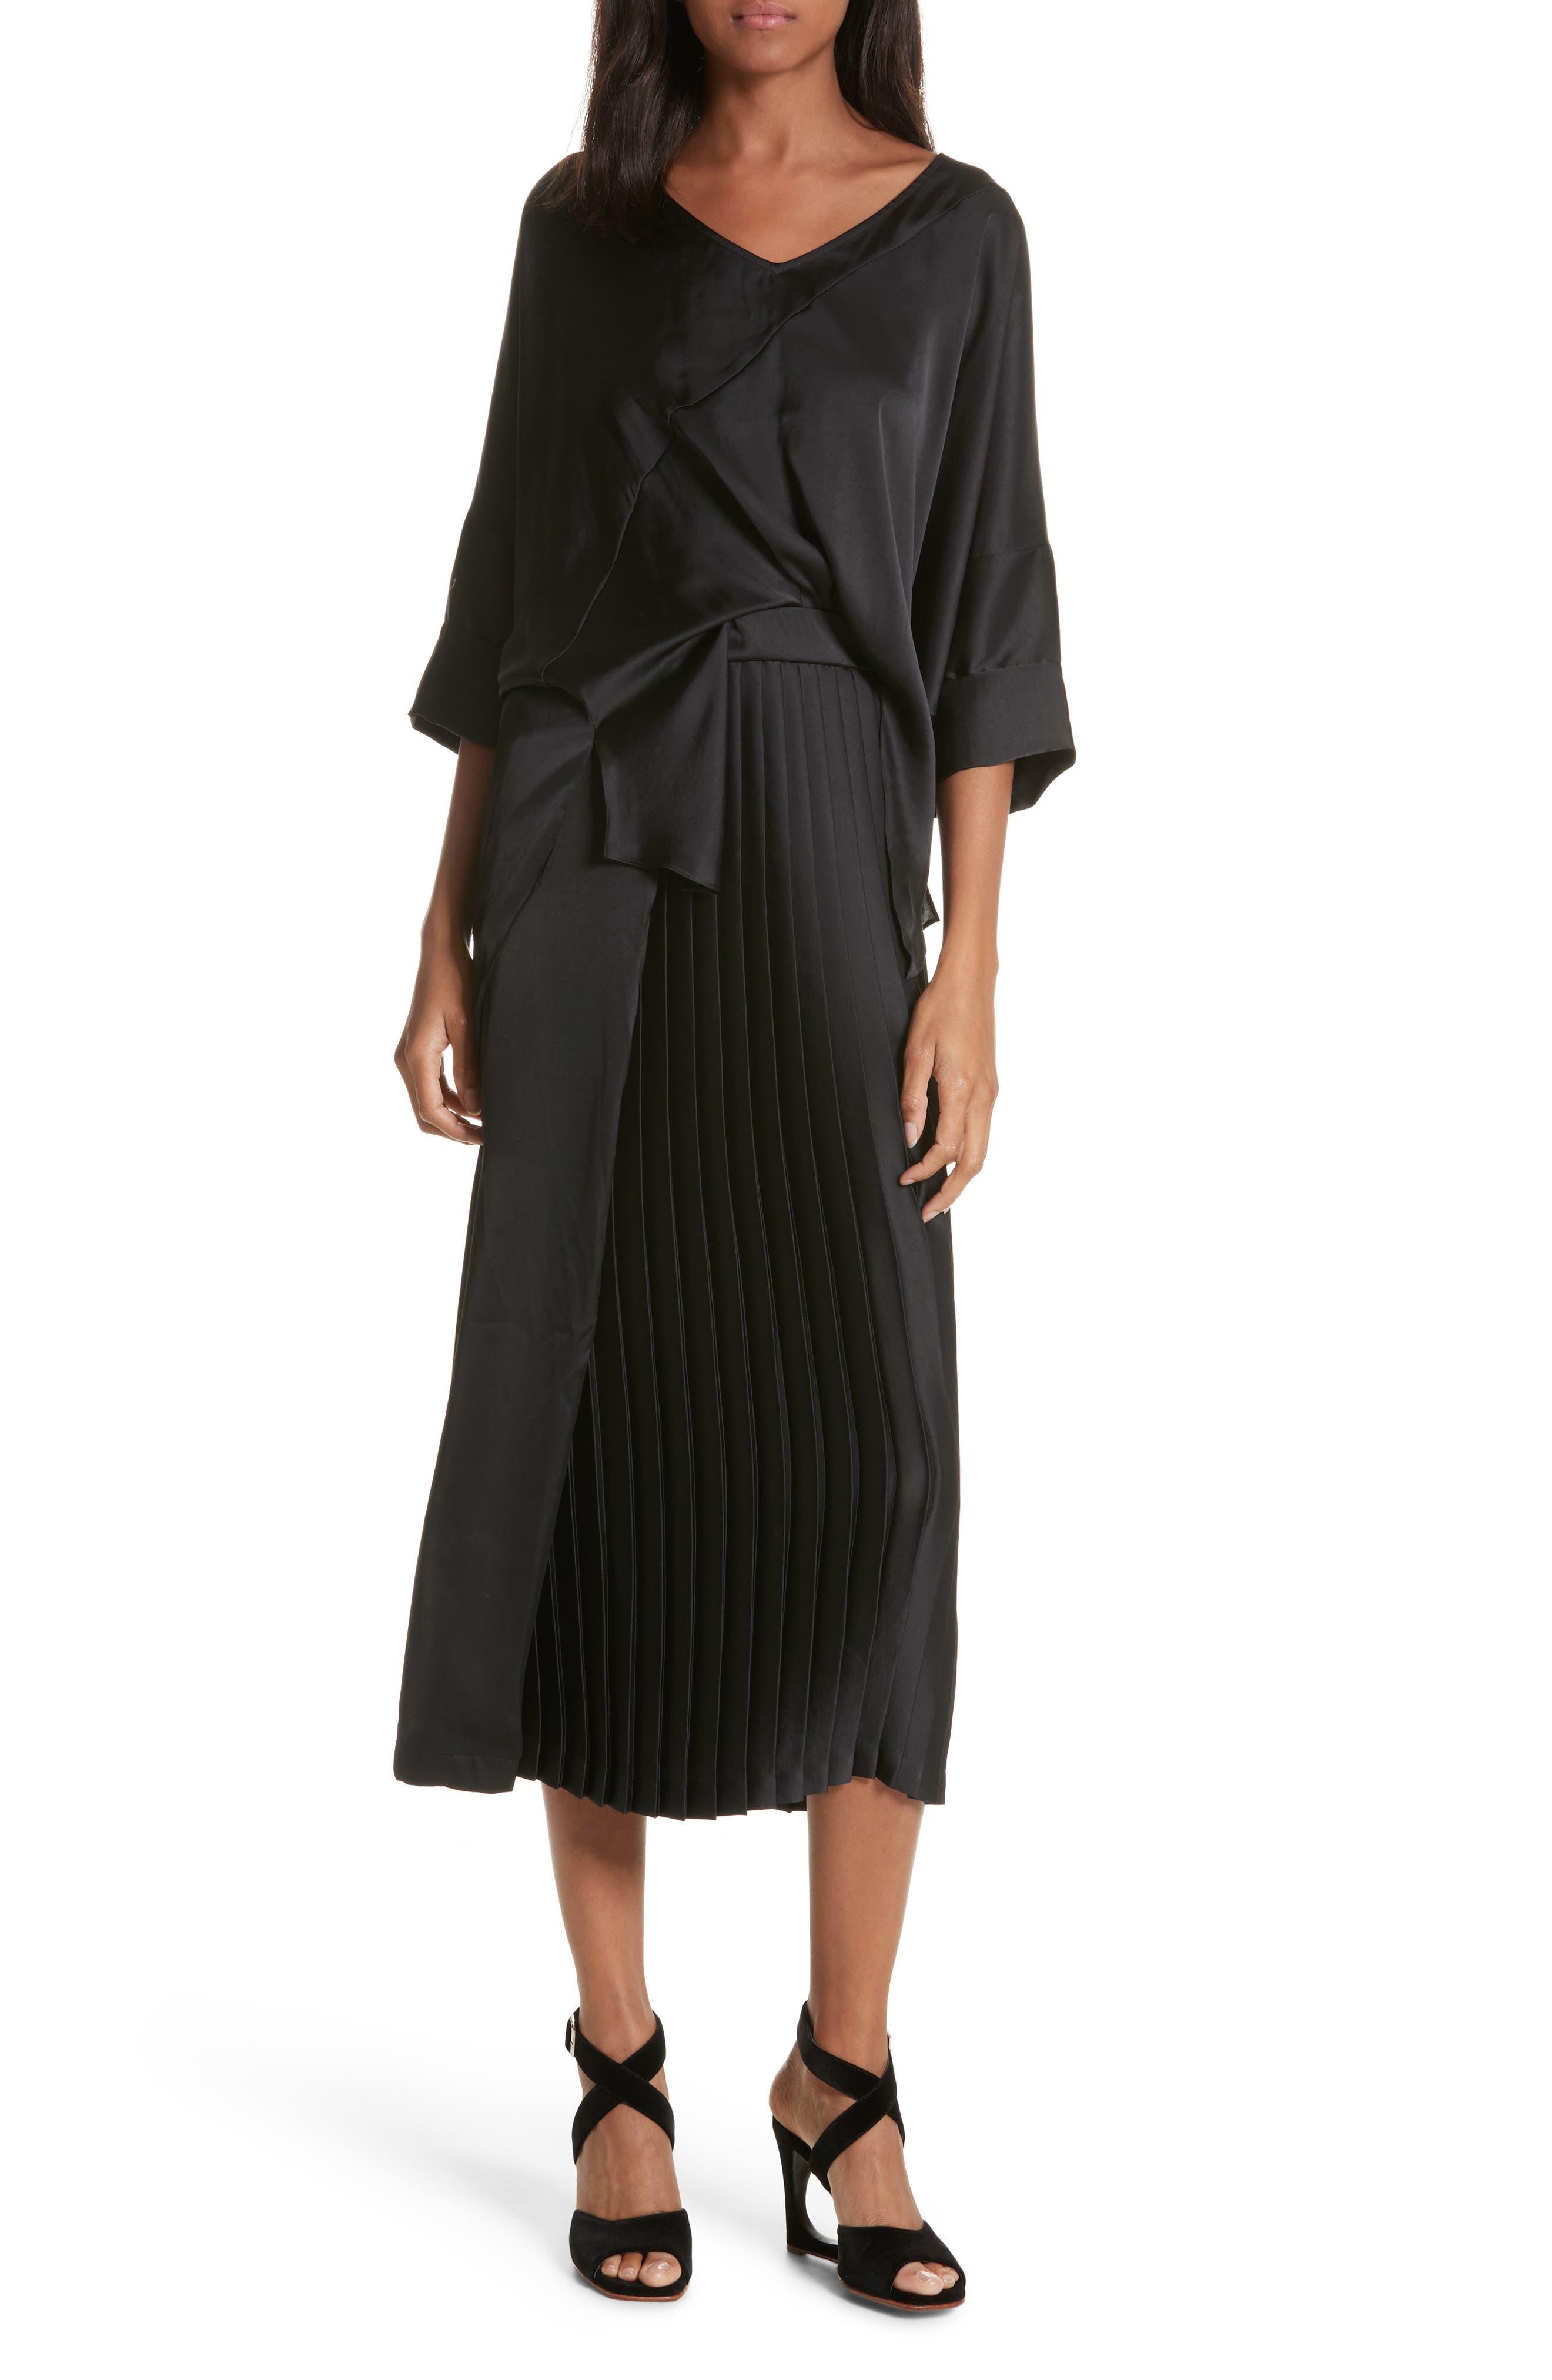 Mure Satin Midi Dress,                             Main thumbnail 1, color,                             001